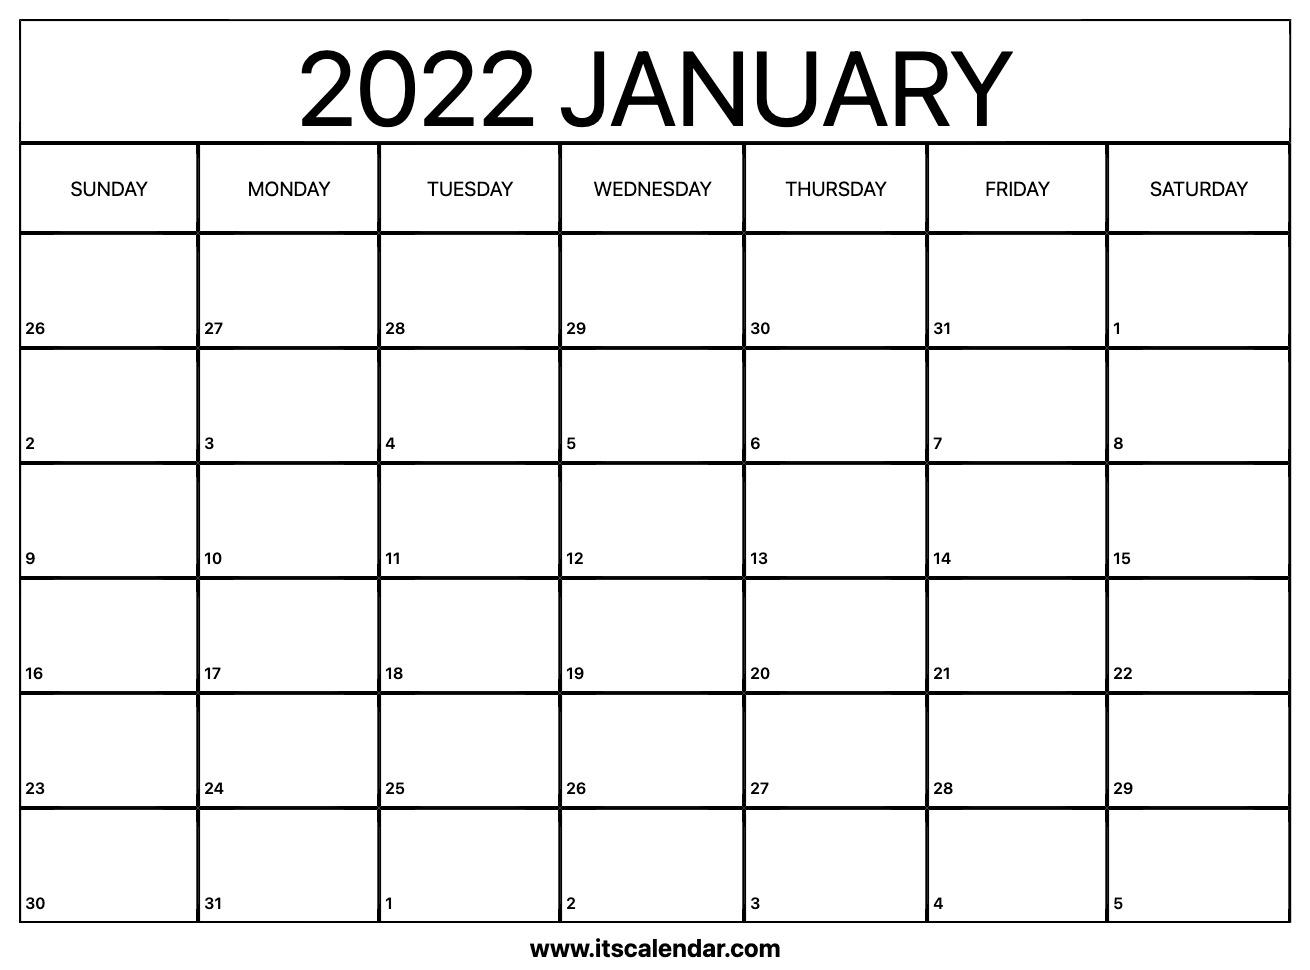 Free Printable January 2022 Calendar Throughout Blank Calendar January 2022 Printable